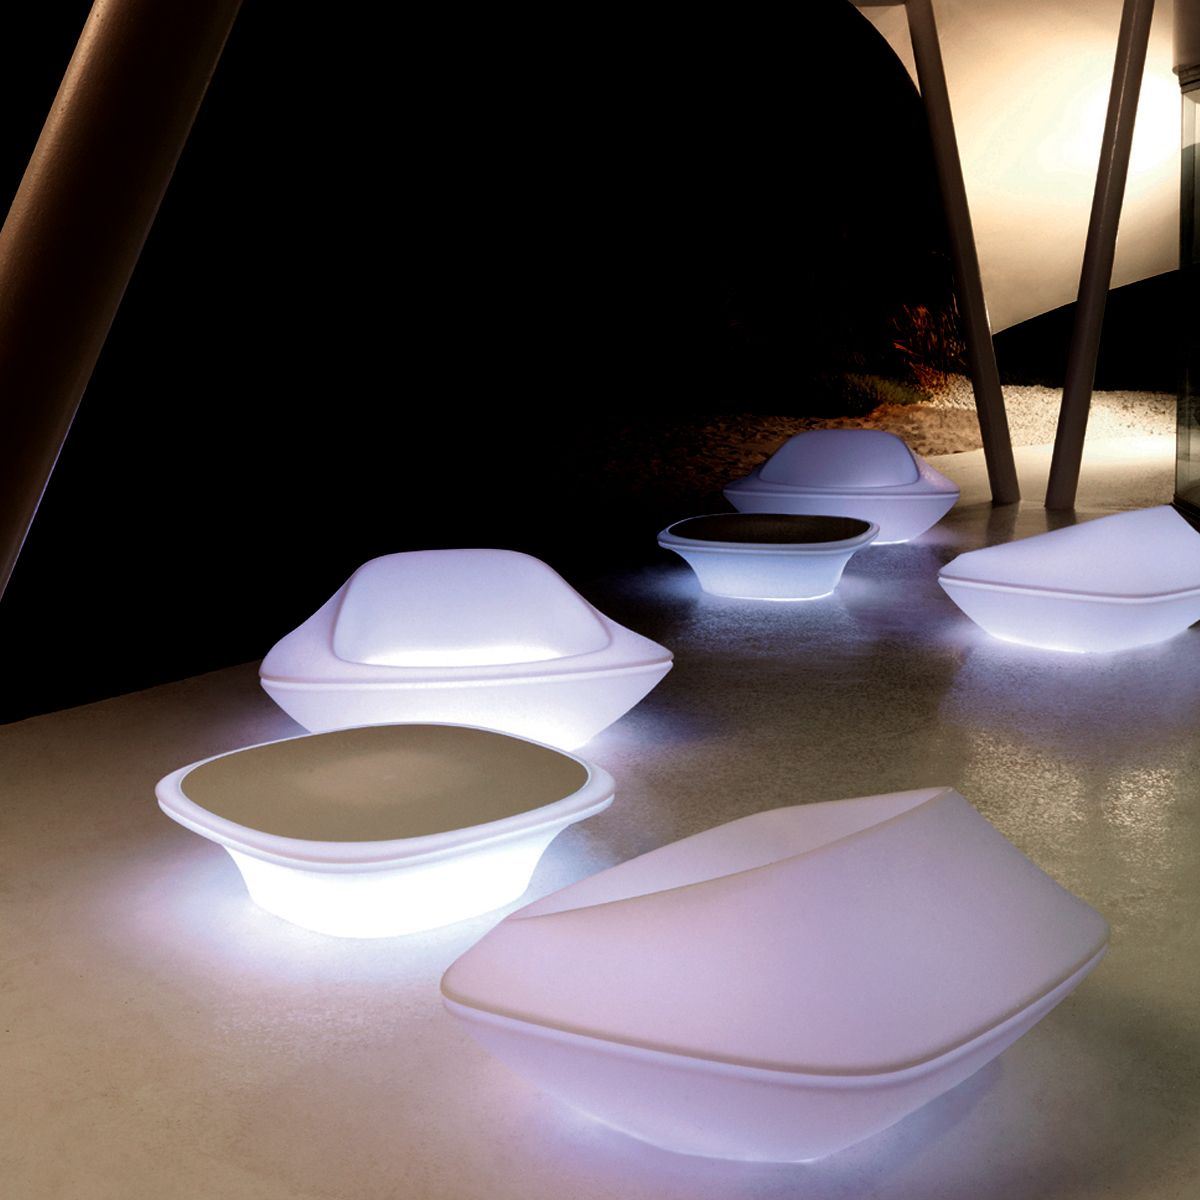 Fauteuil jardin lumineux design tendance ufo vondom deco - Mobilier jardin lumineux ...